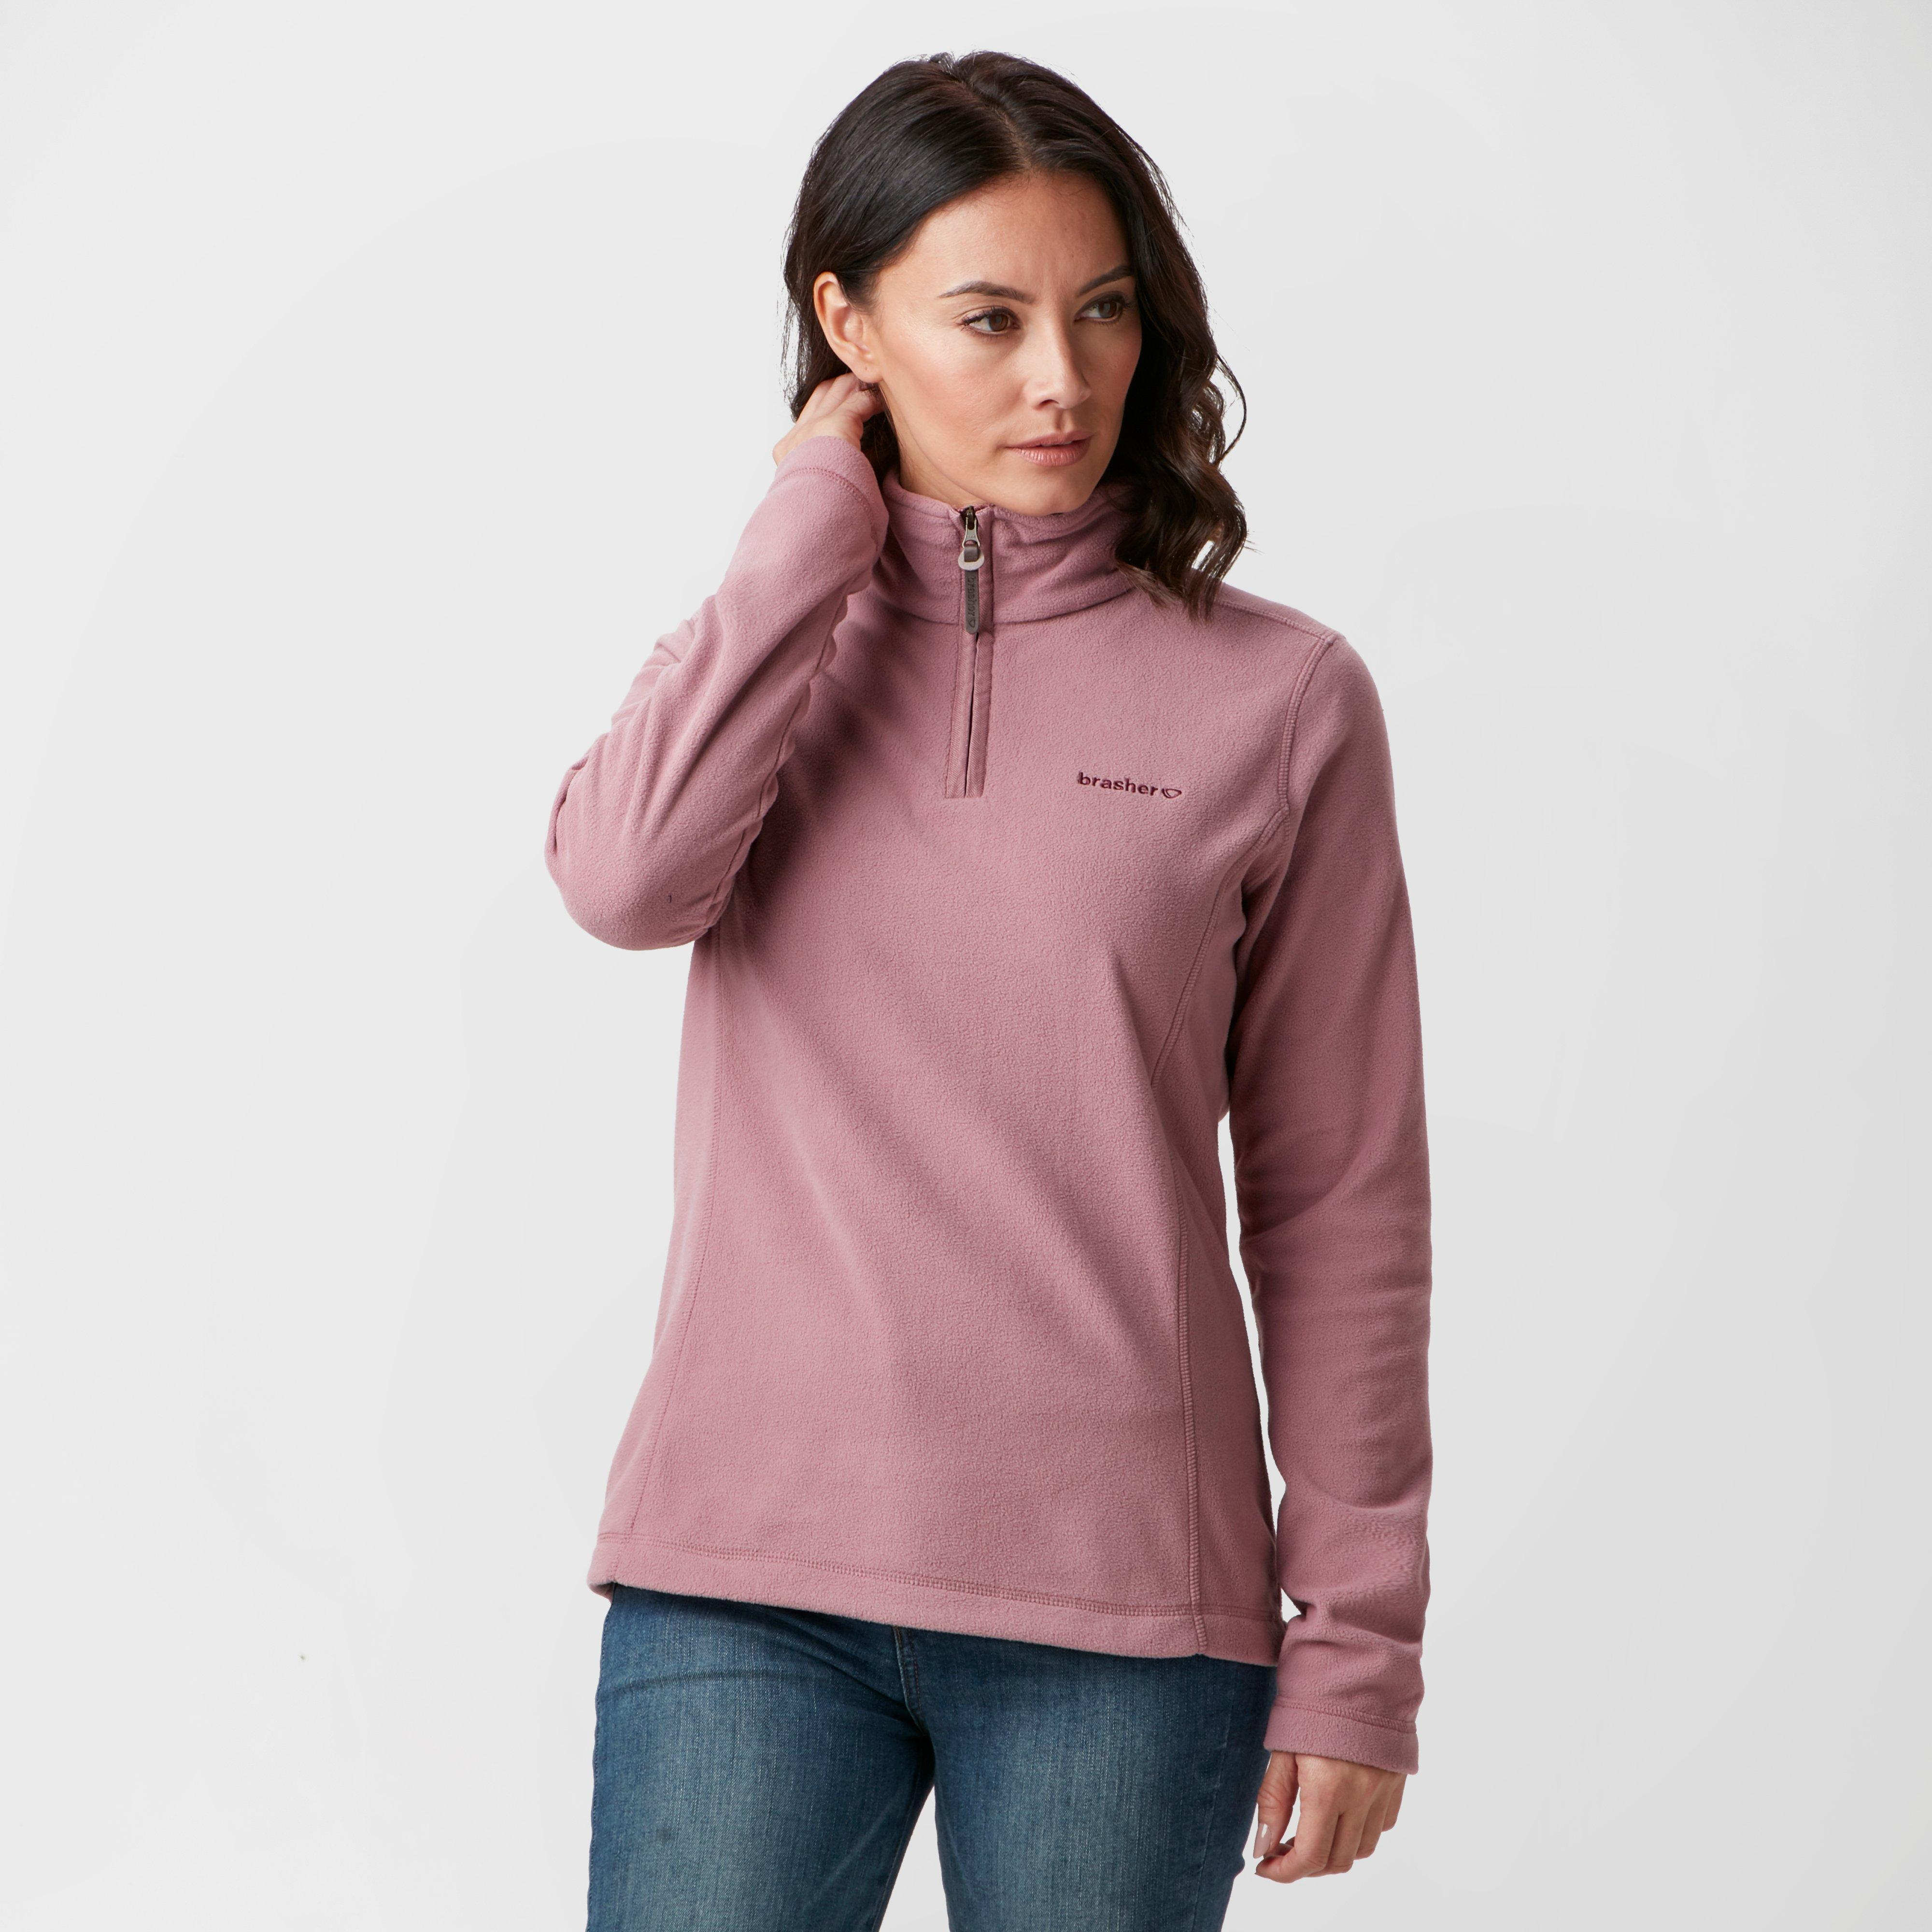 Brasher Womens Bleaberry Half Zip Fleece - Pink/pink  Pink/pink